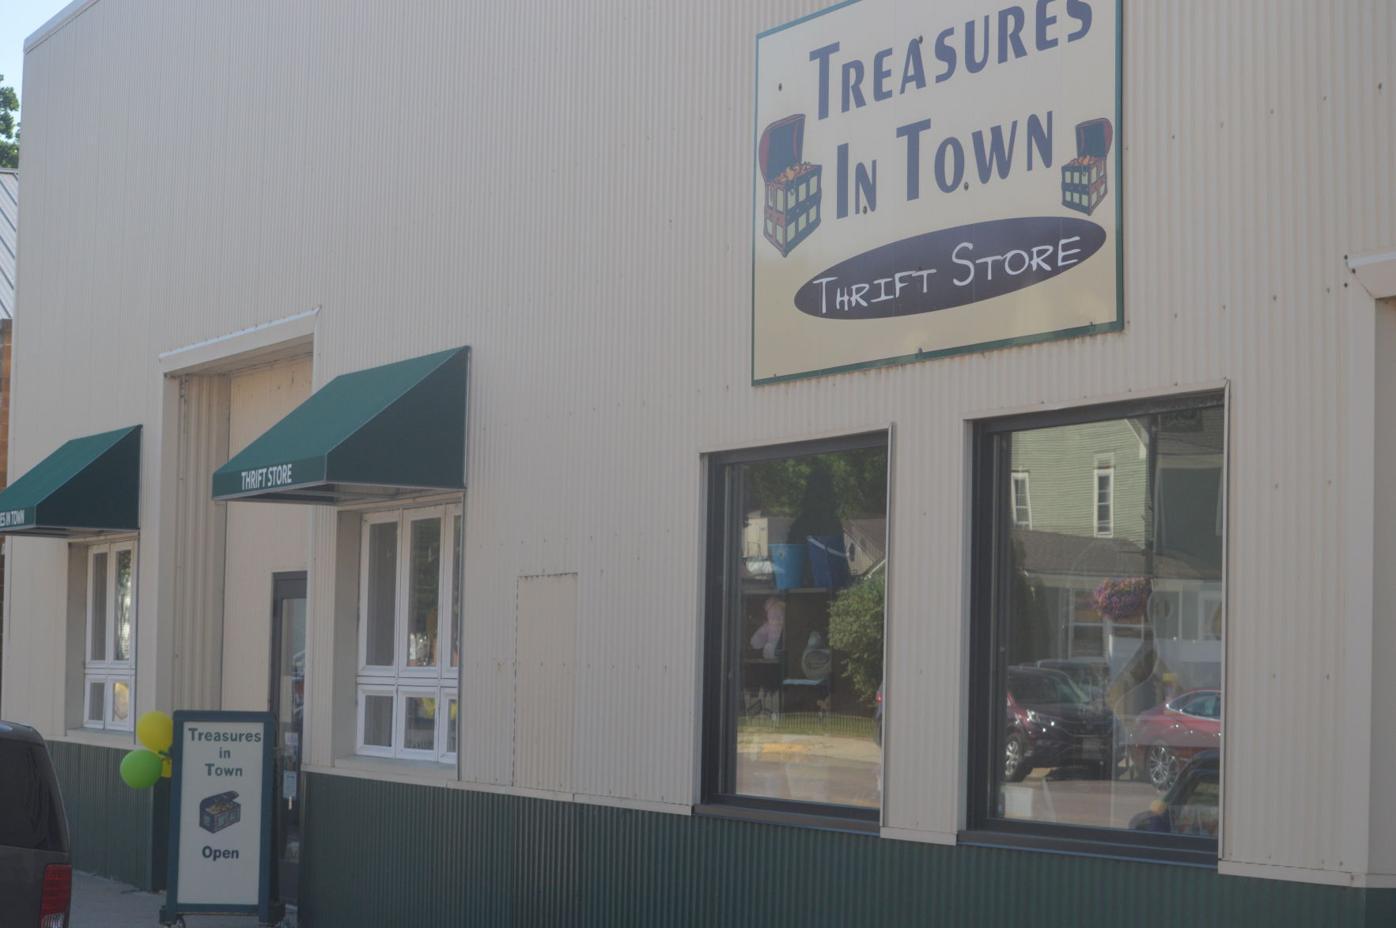 Treasures in Town